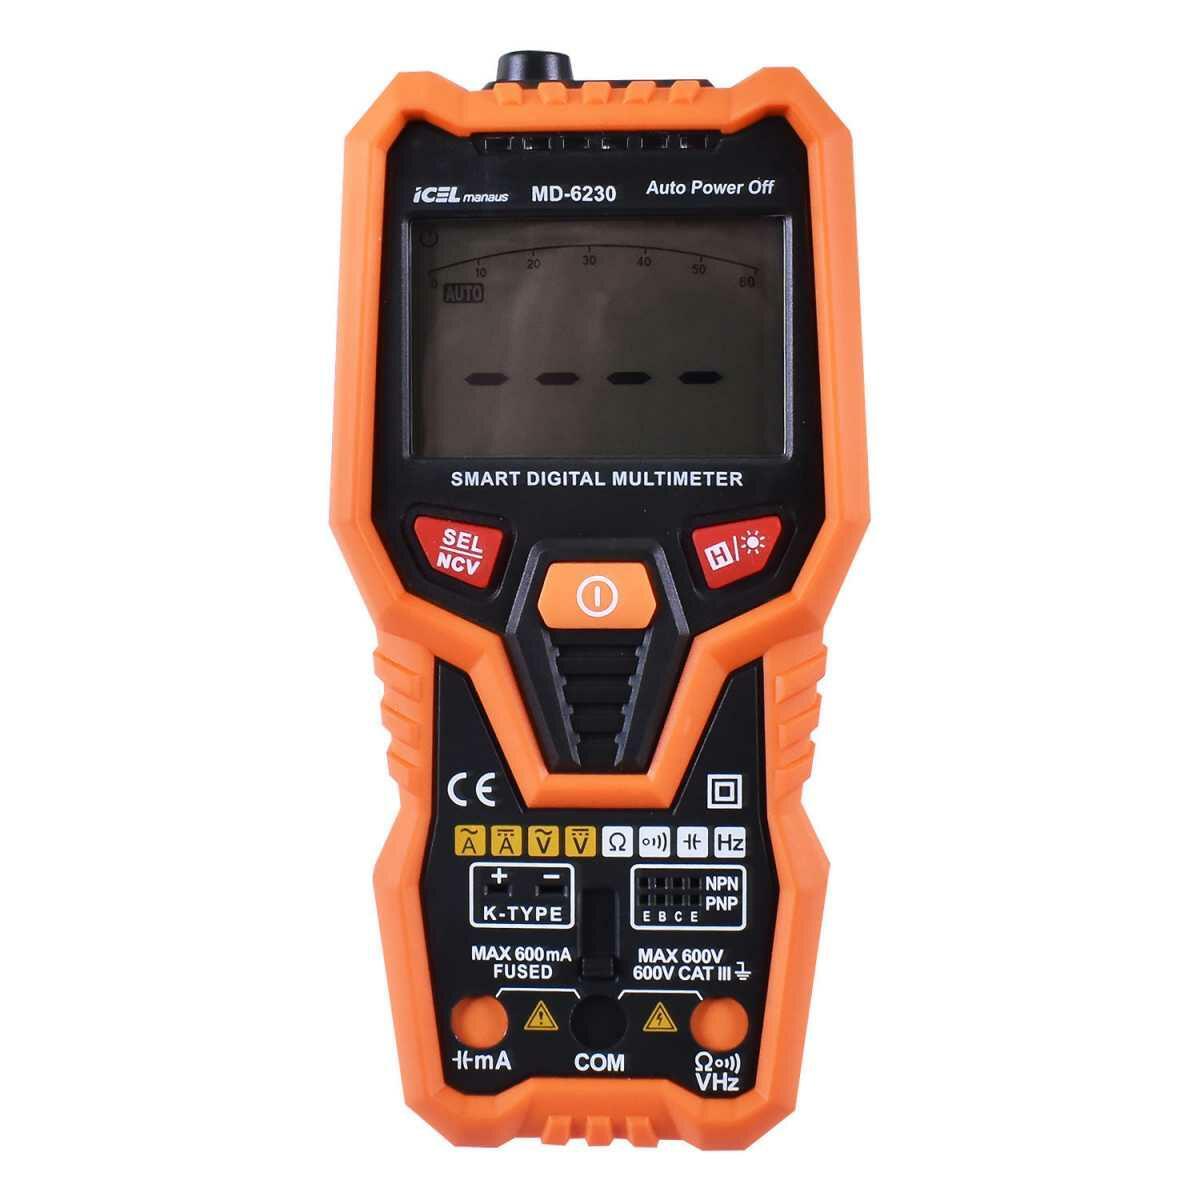 Multímetro Digital Ac/dc 600 Ma Smart Md-6230 Icel Manaus